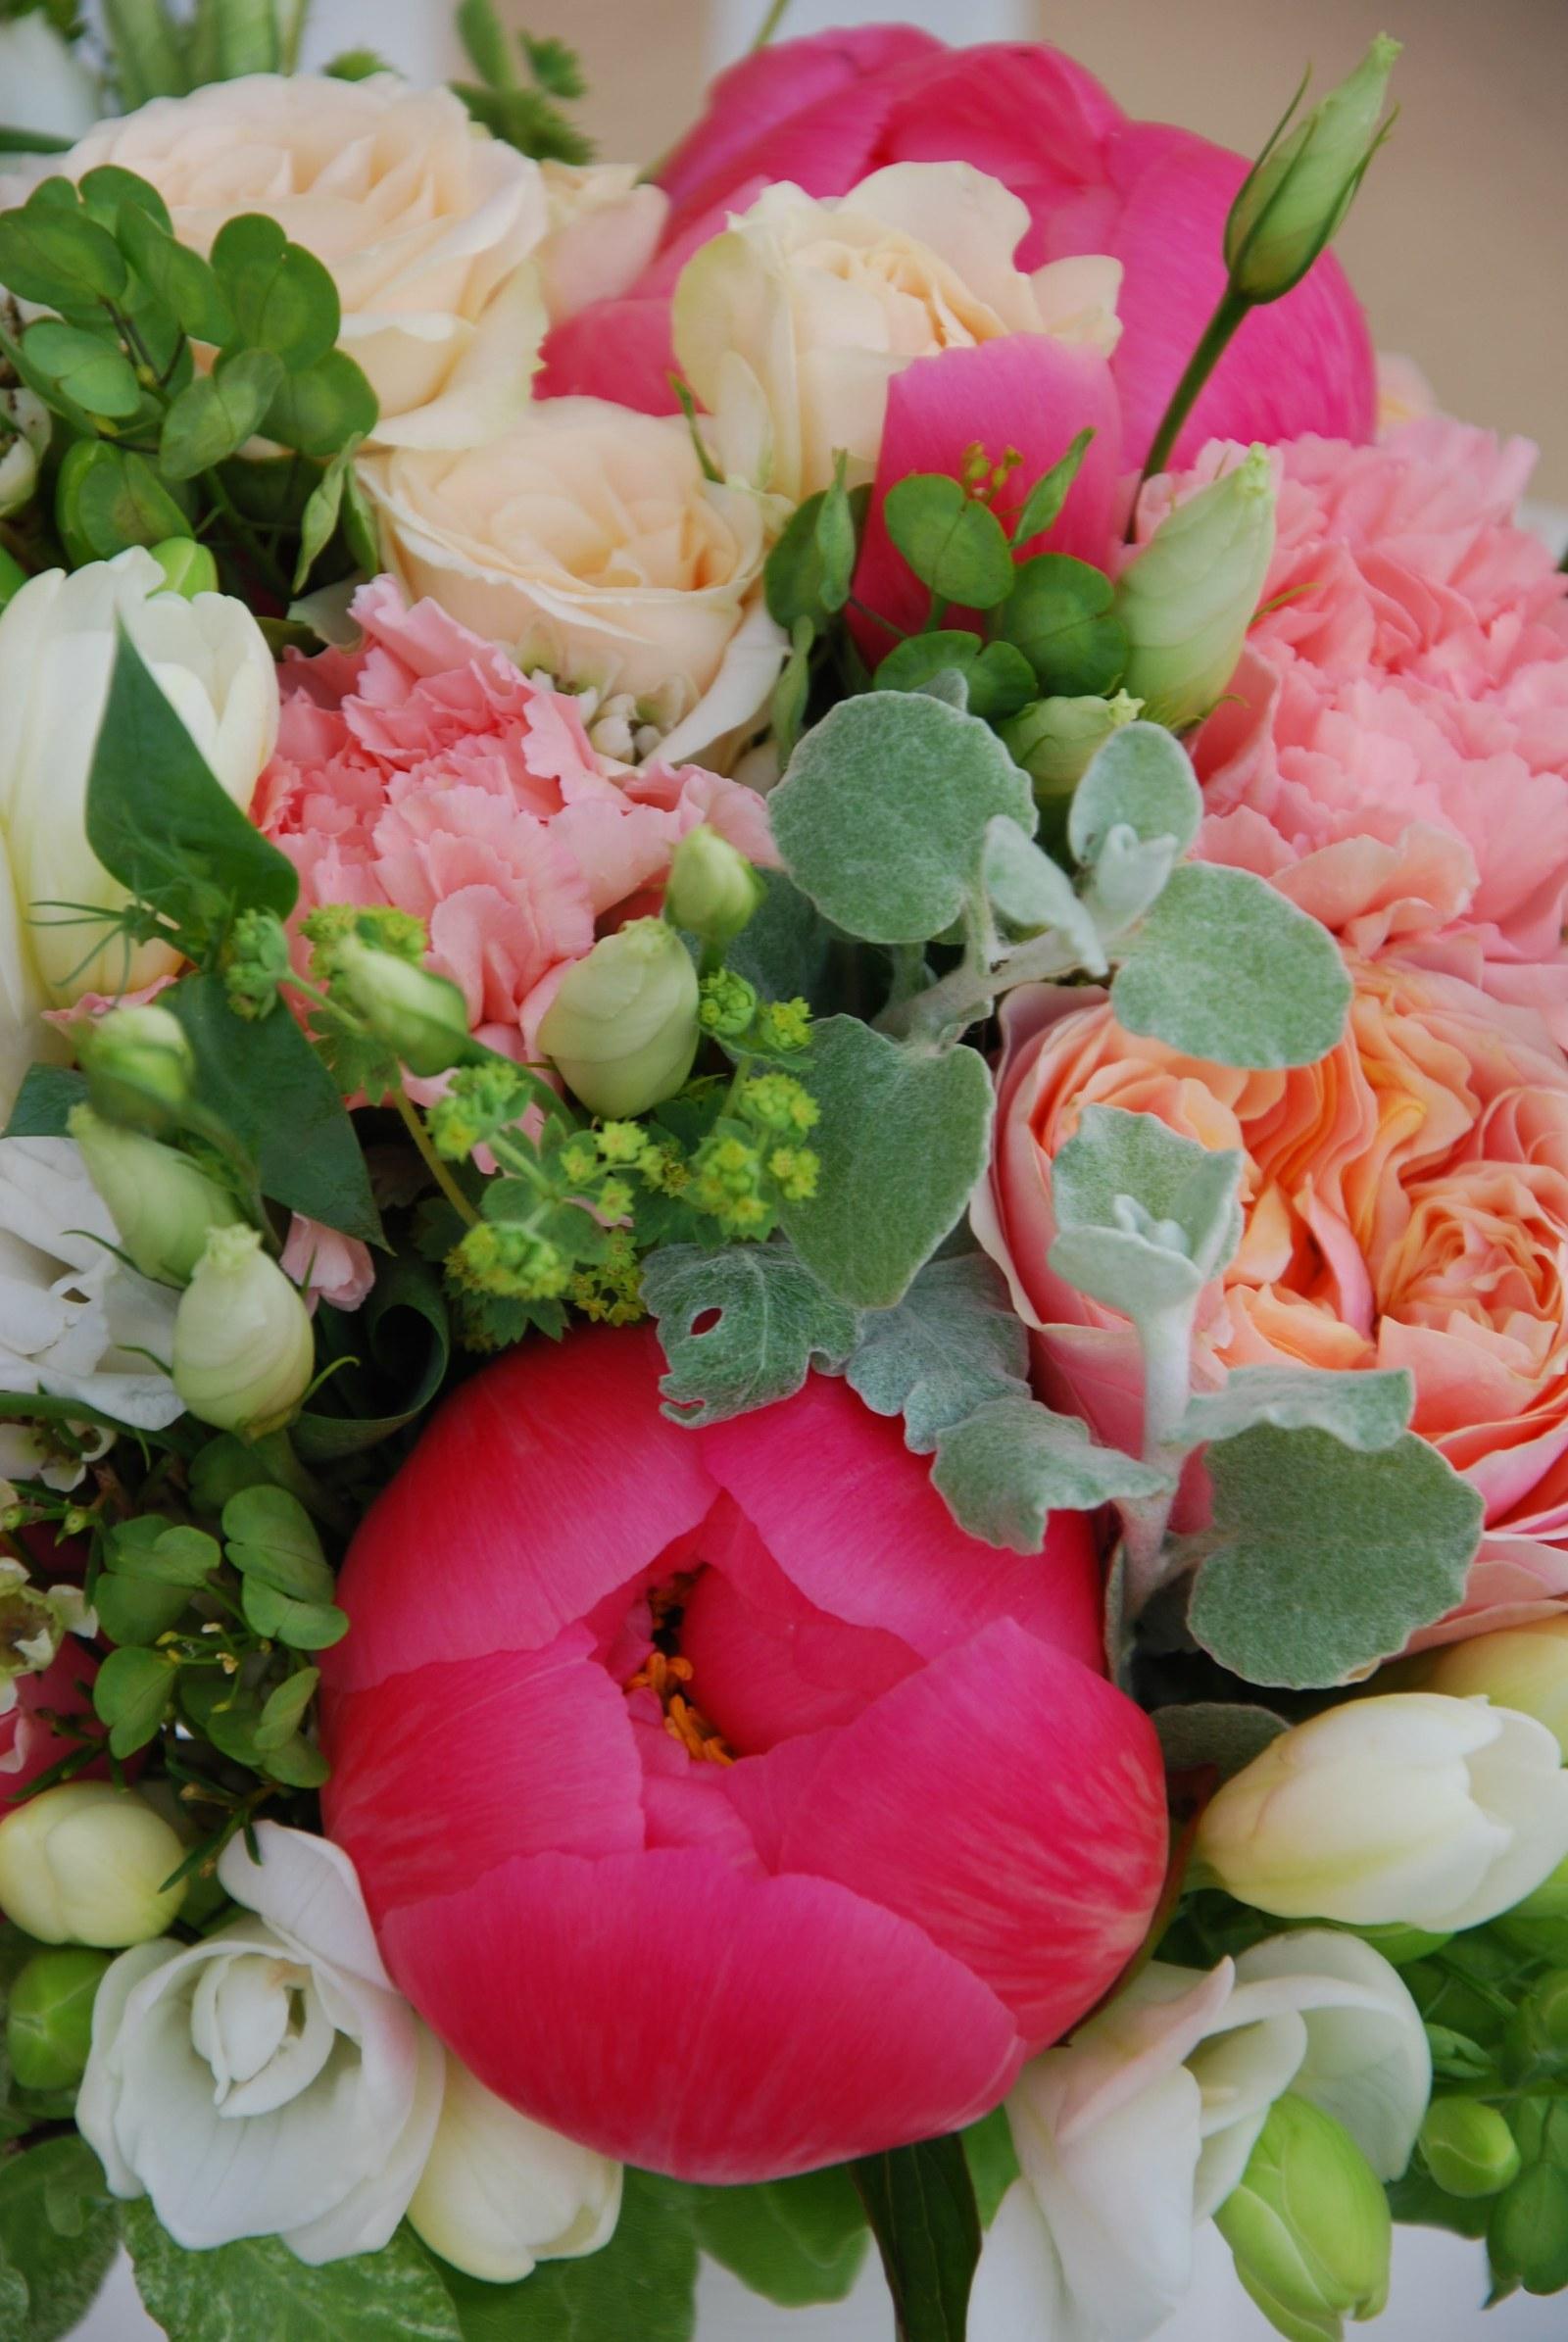 Pivonkova Svatba V Barve Lososove Zbozi Prodejce Flowers And